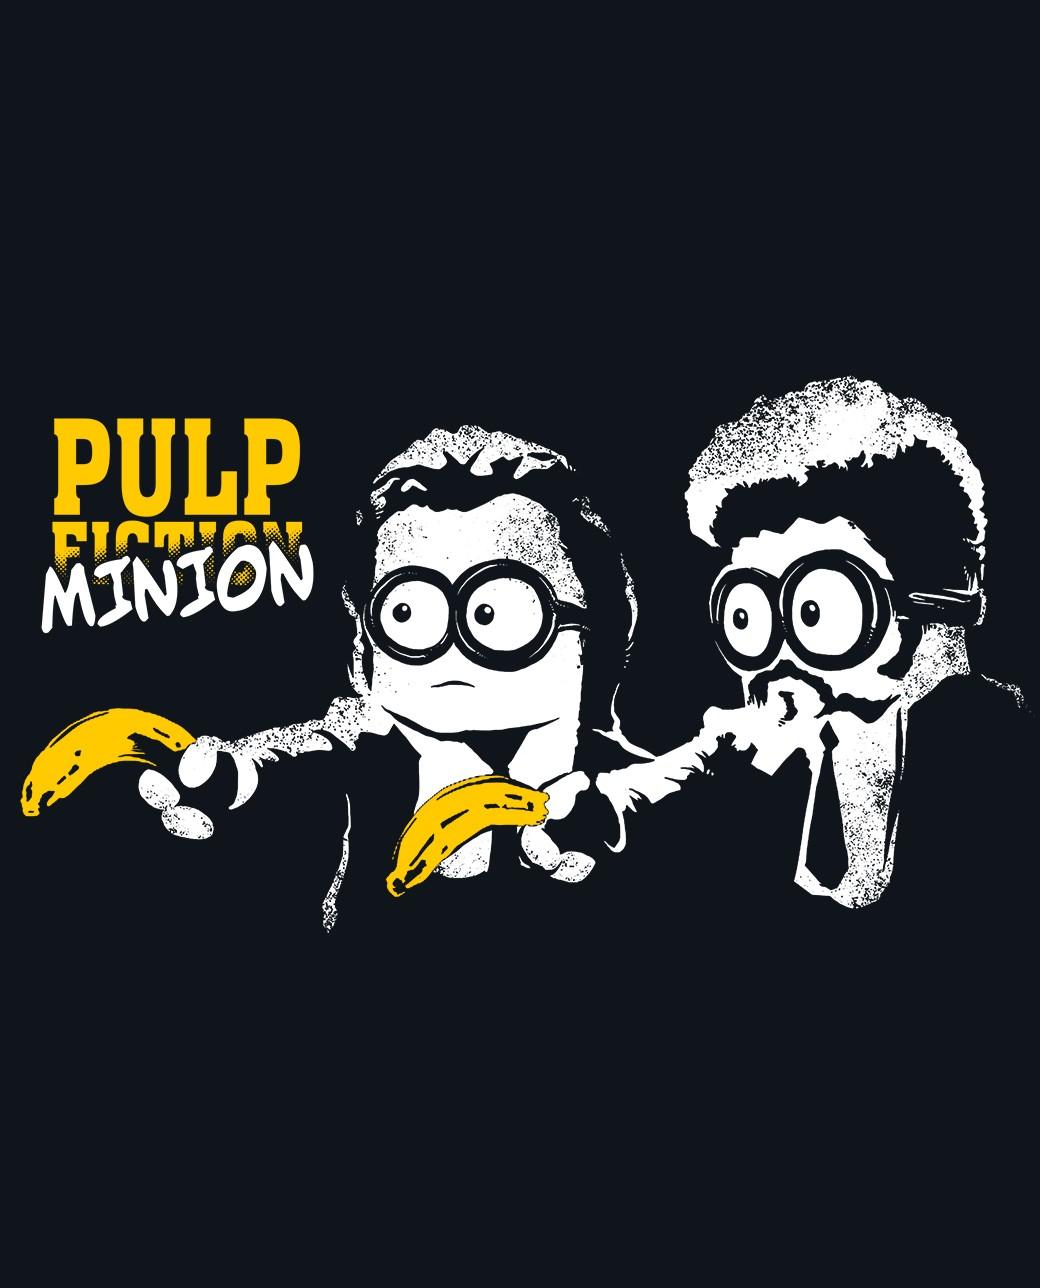 PULP MINION